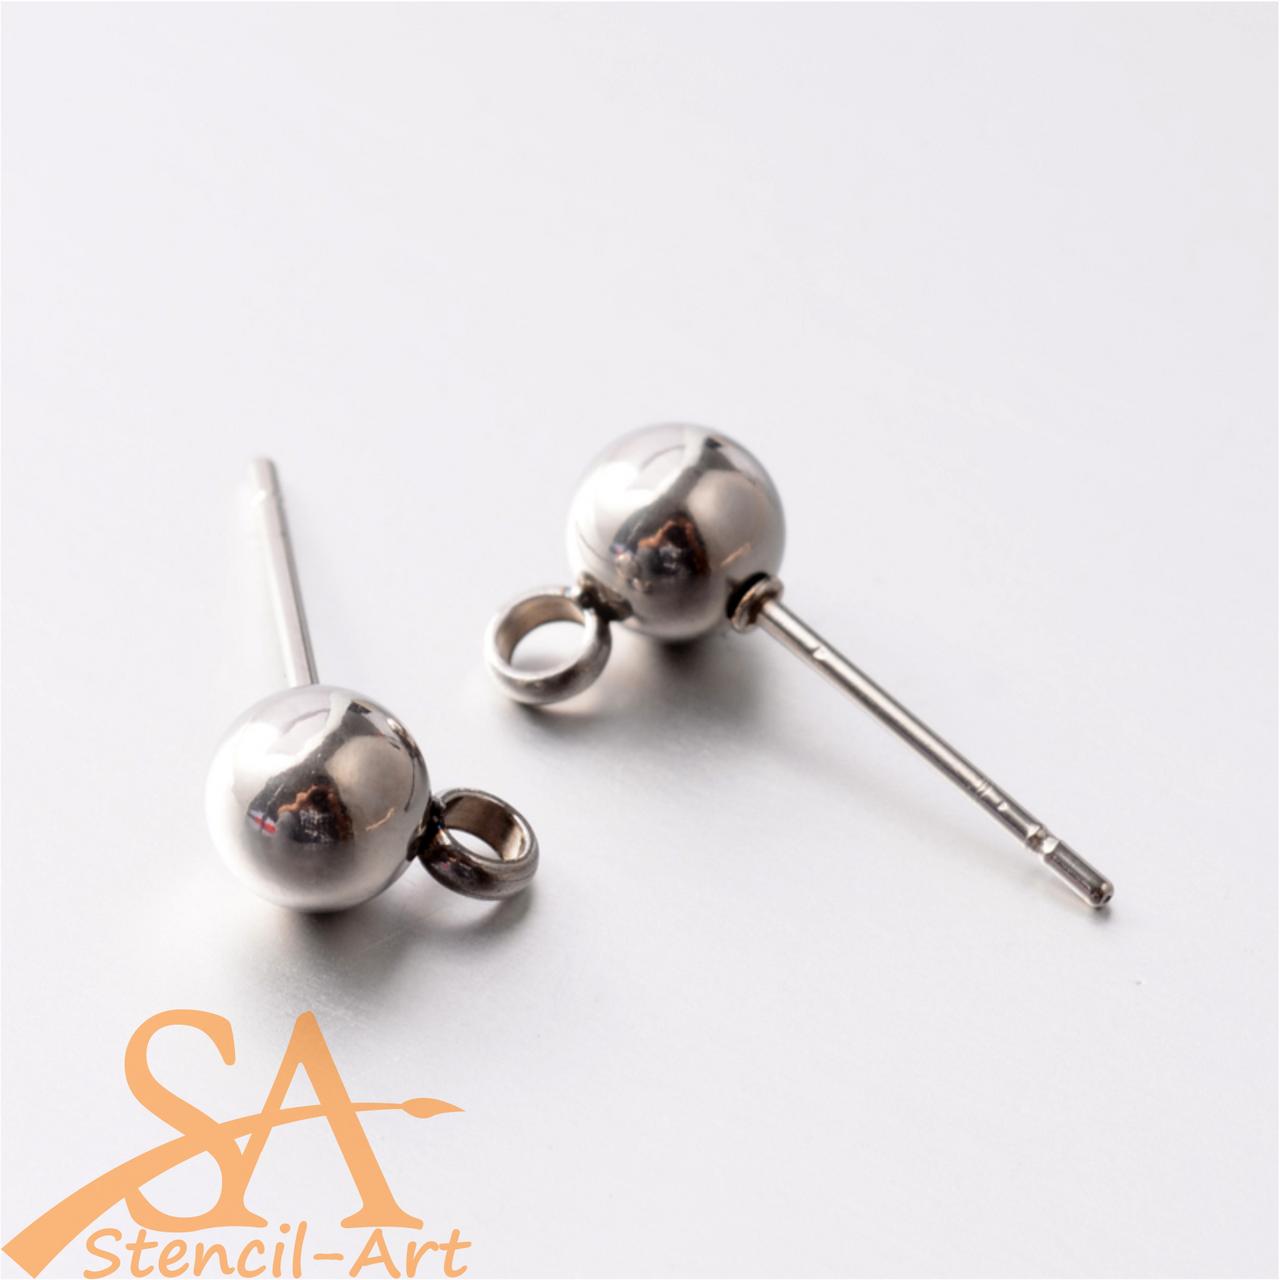 304 Stainless Steel Earring Stud Ball & Loop 5mm 20 pieces